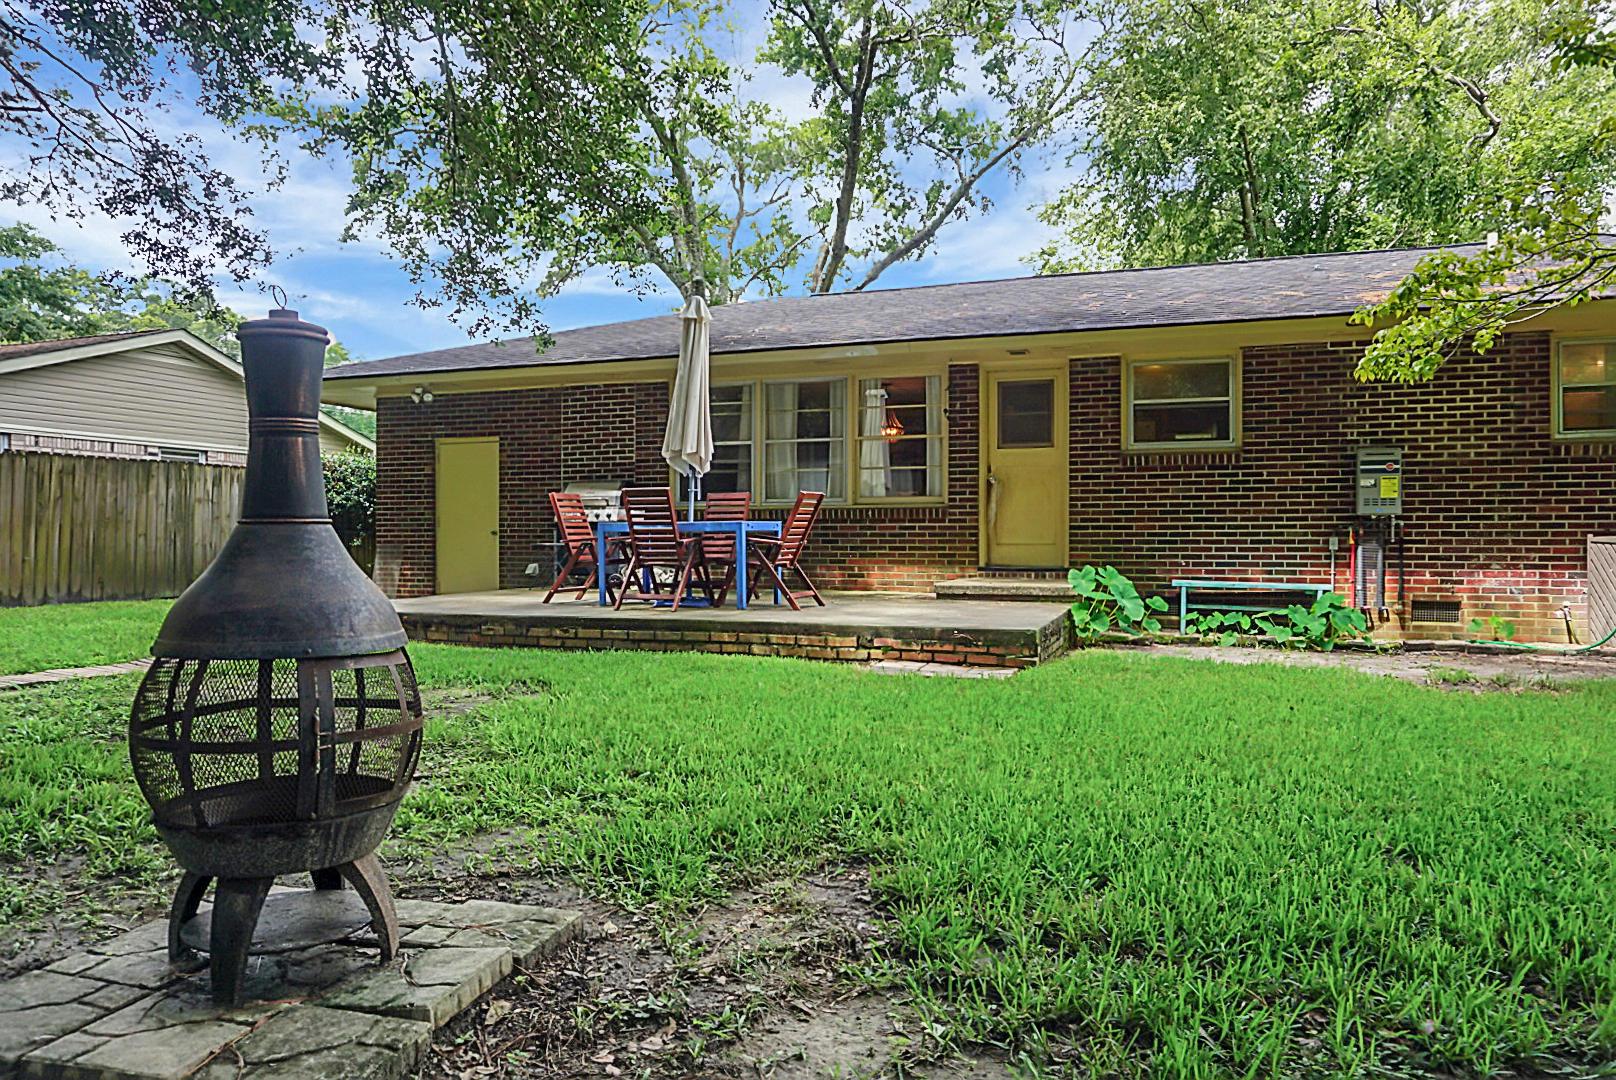 Oakland Homes For Sale - 408 Arlington, Charleston, SC - 0